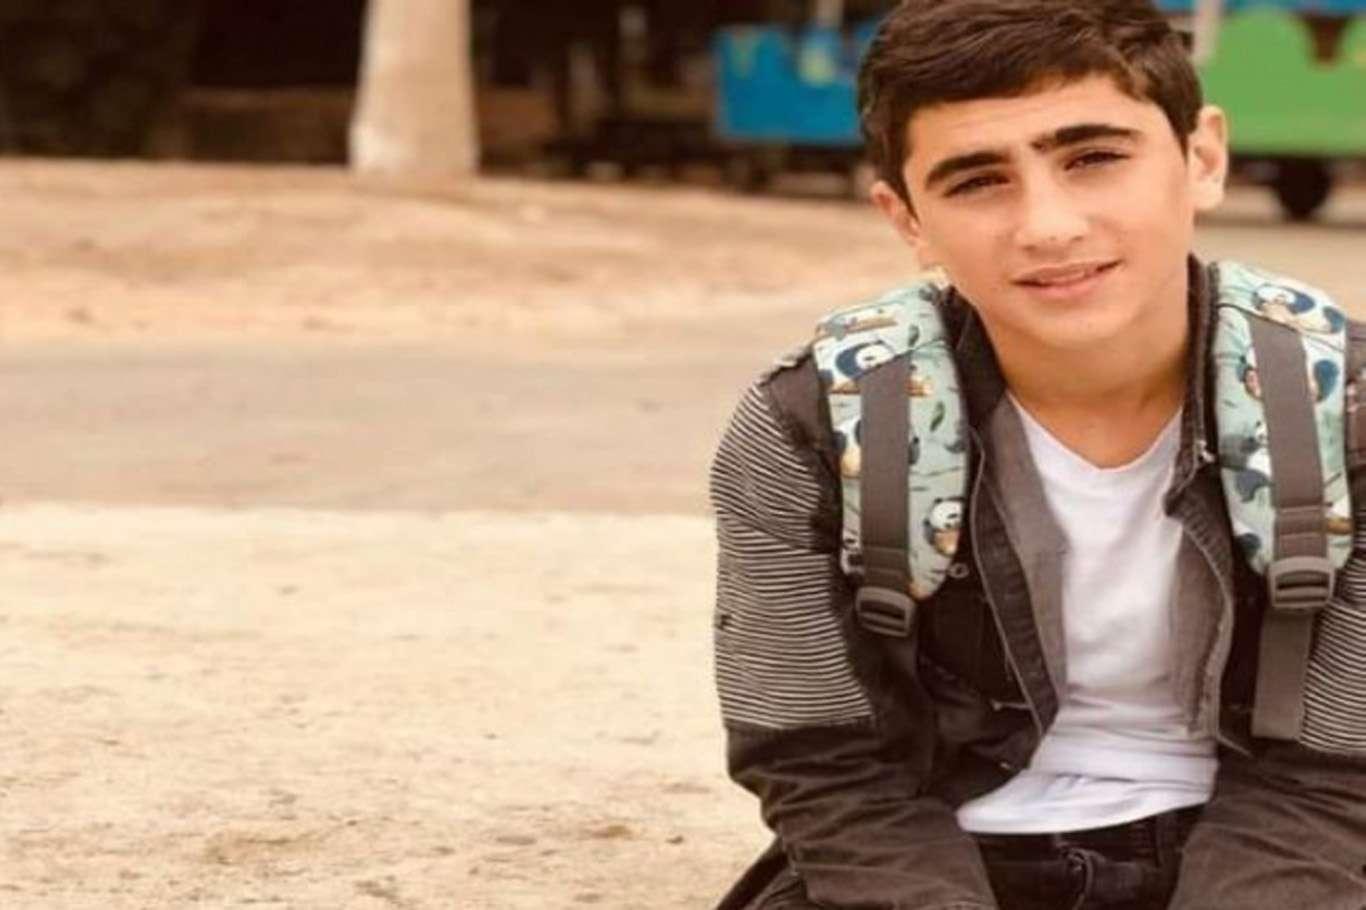 İşgalci Siyonistler Filistinli çocuğu katletti